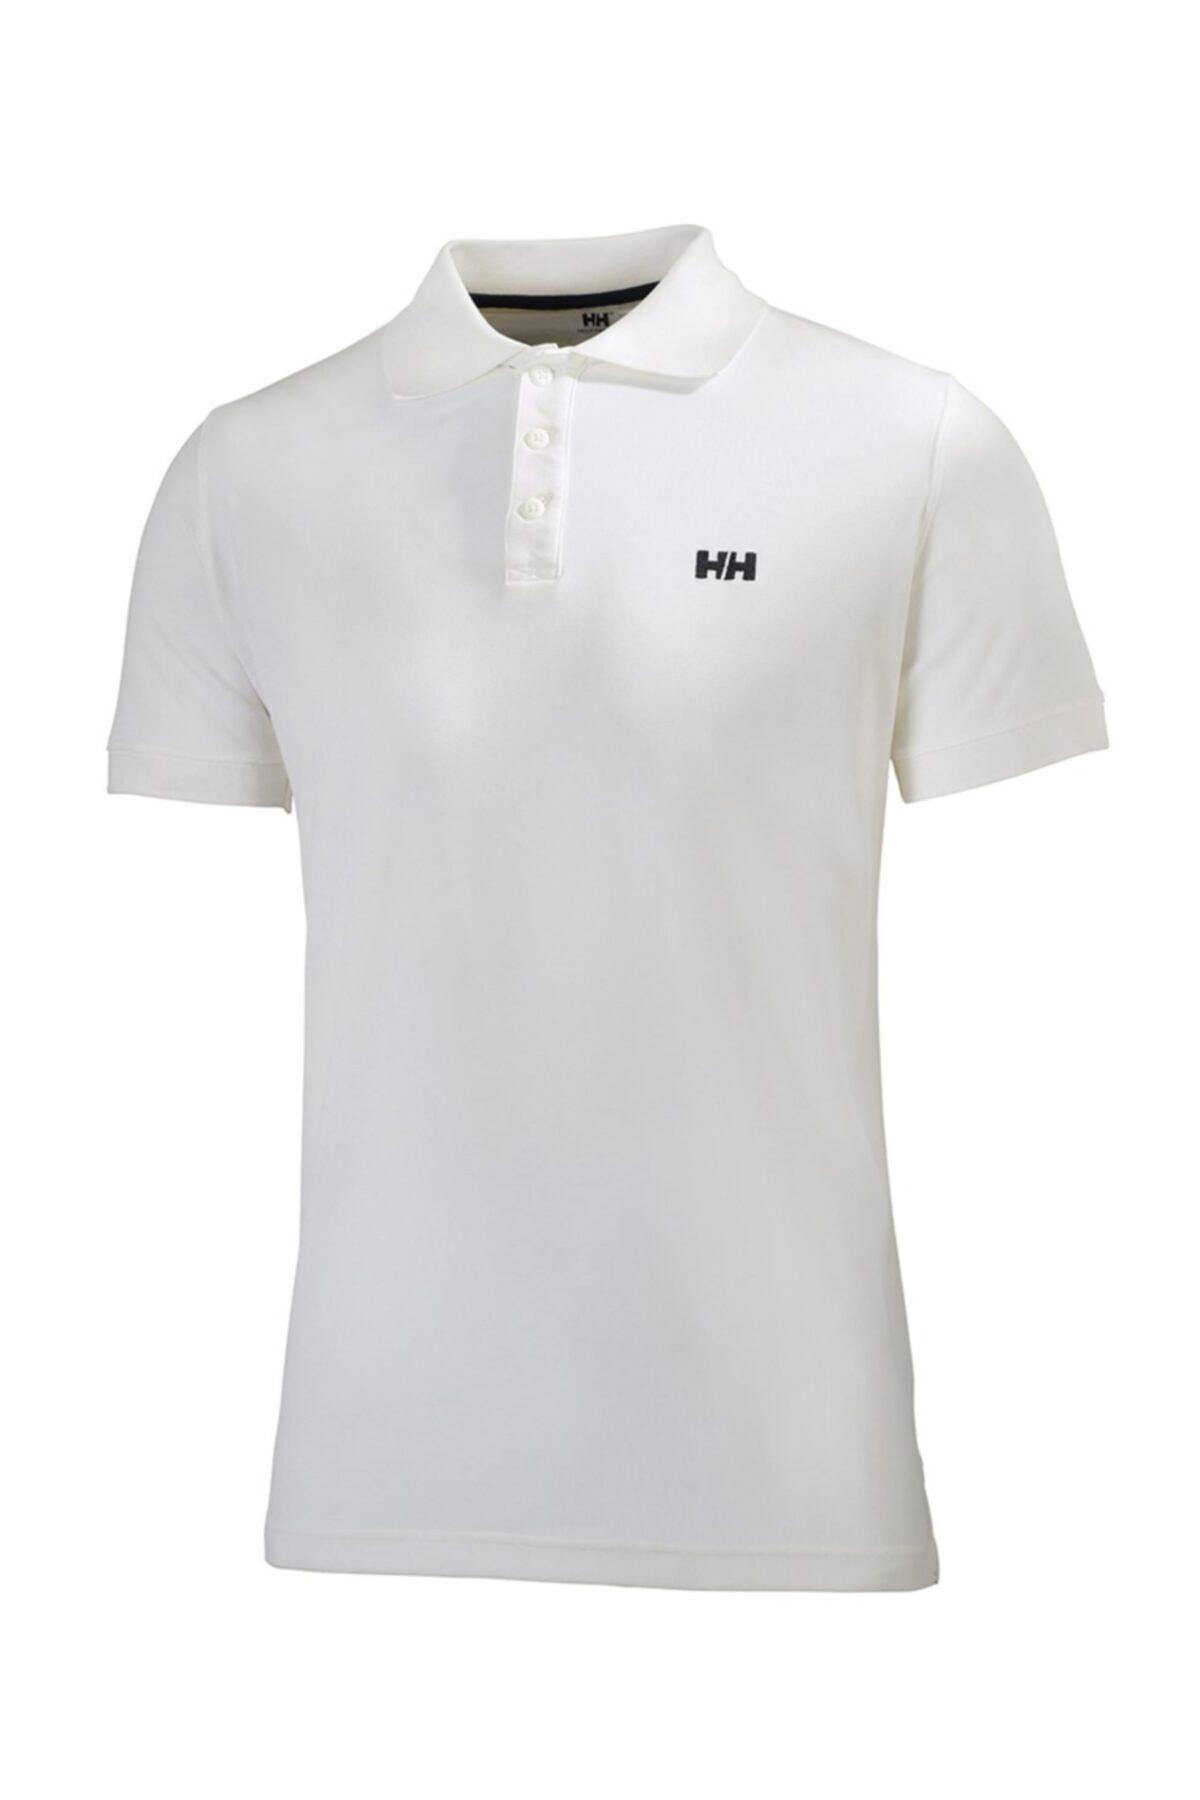 Helly Hansen Driftline Erkek Polo T-shirt Beyaz 1